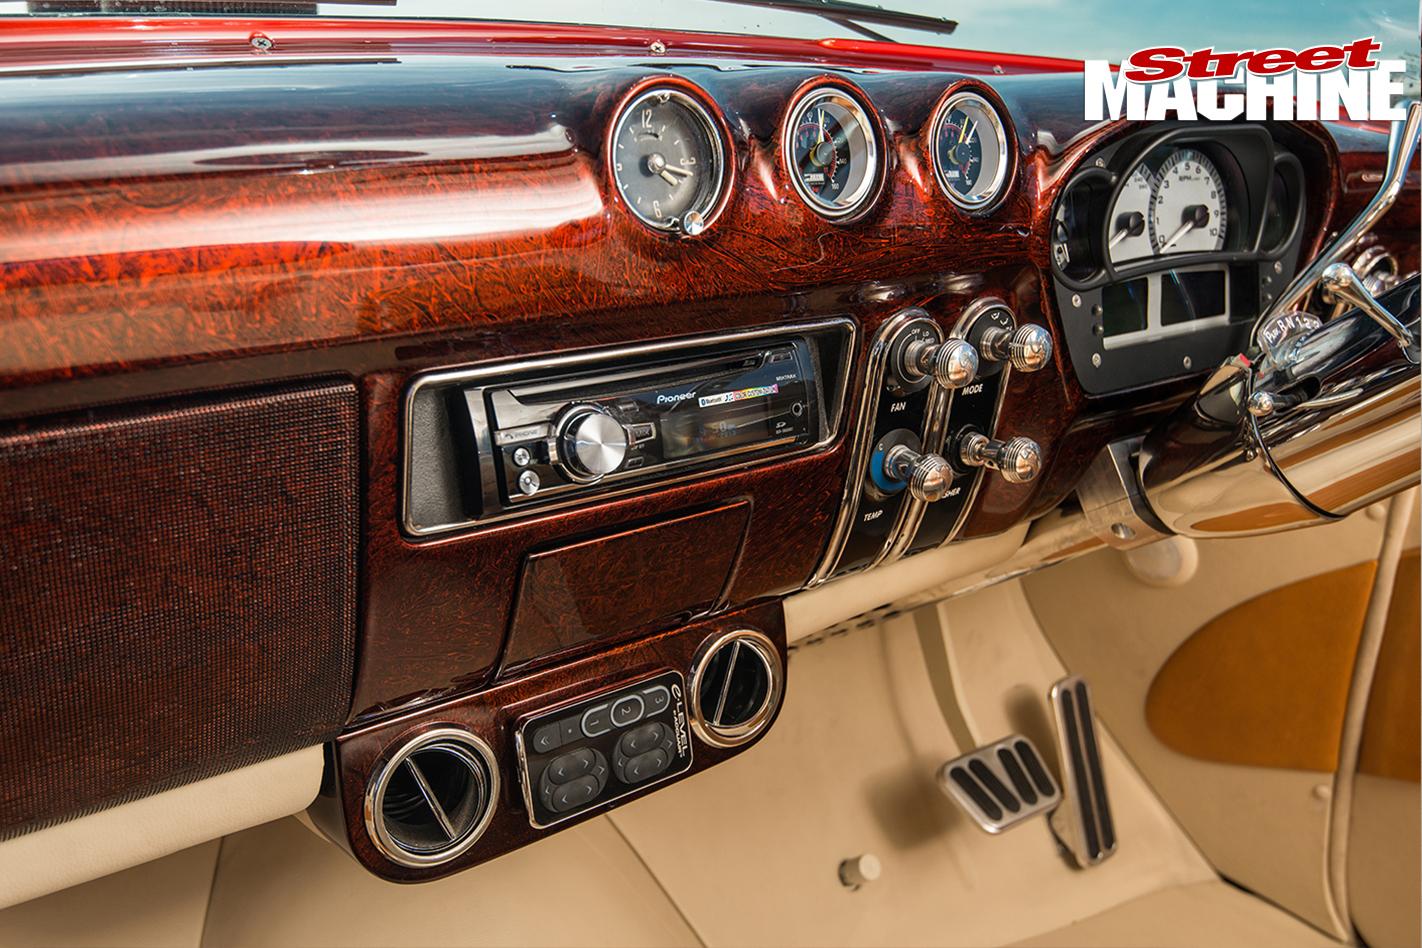 Ford -mainline -ute -old -skool -interior -dash